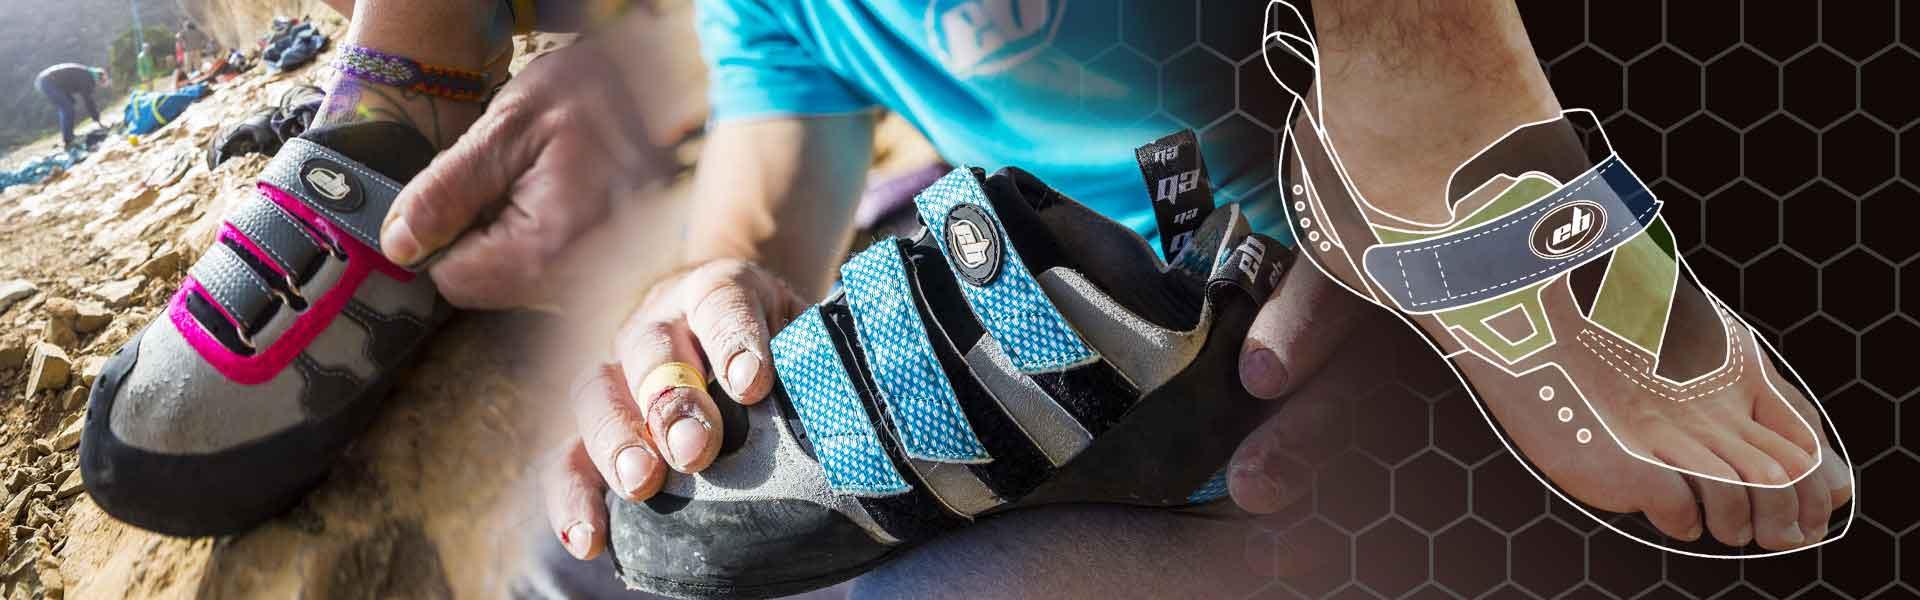 choose your climbing shoes